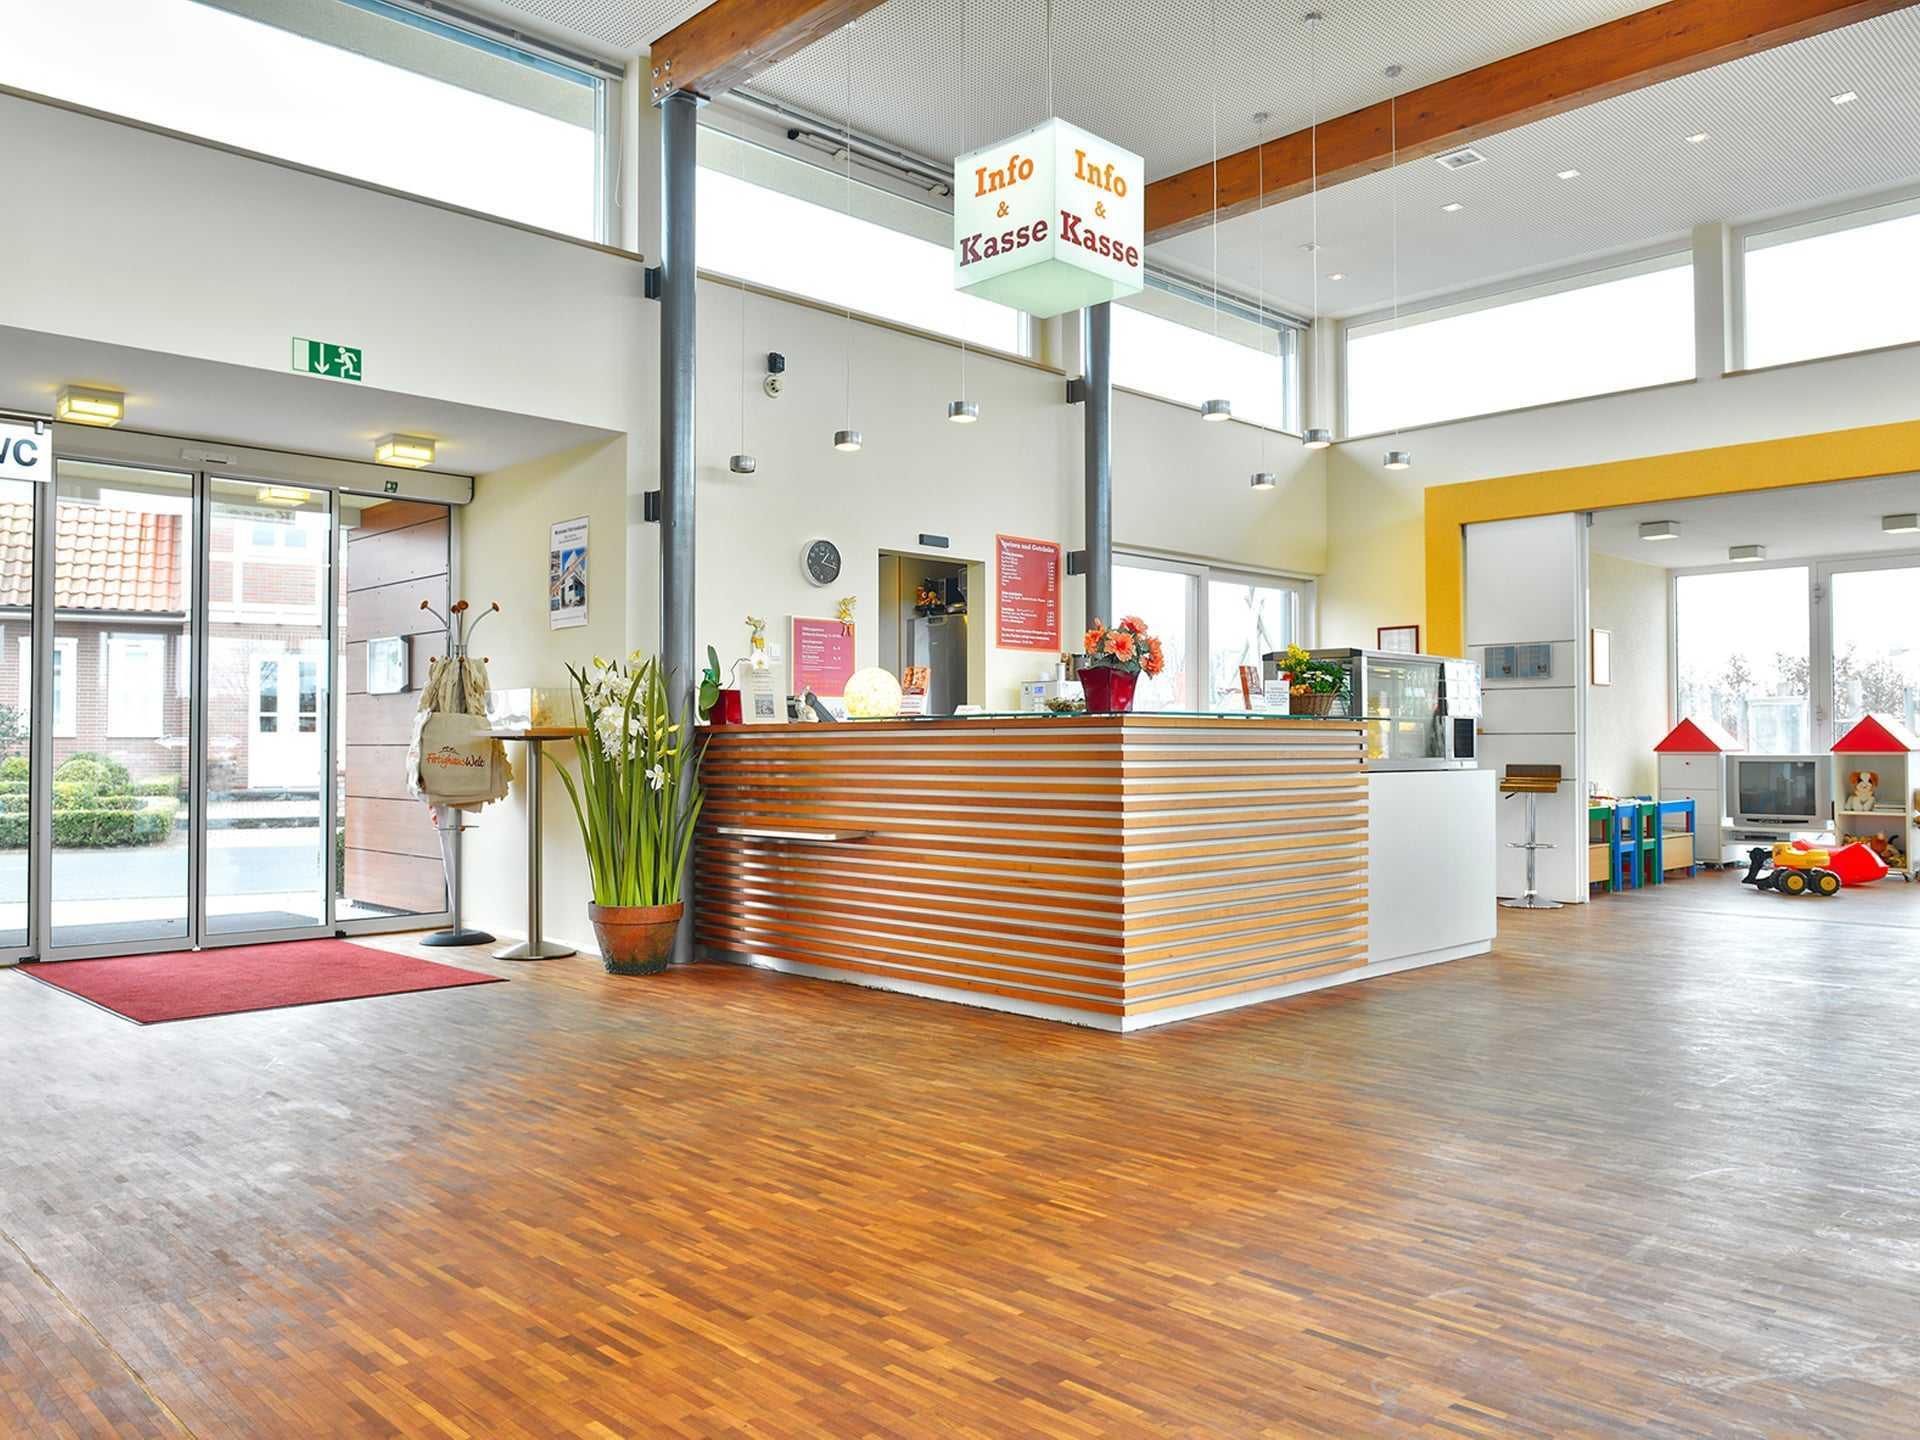 Baufirma Hannover musterhauspark fertighauswelt am flughafen hannover